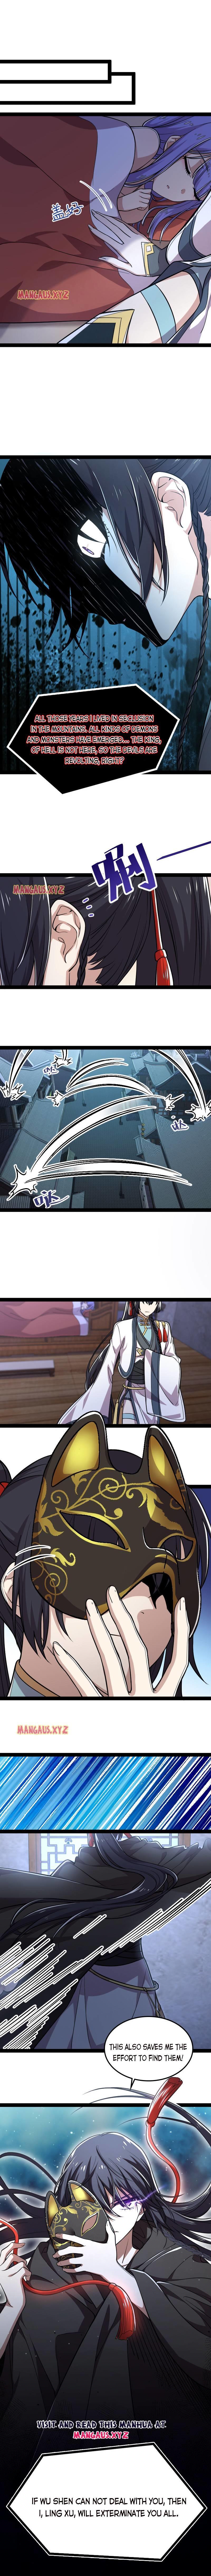 Life Of A War Emperor After Retirement Chapter 32 page 7 - Mangakakalots.com